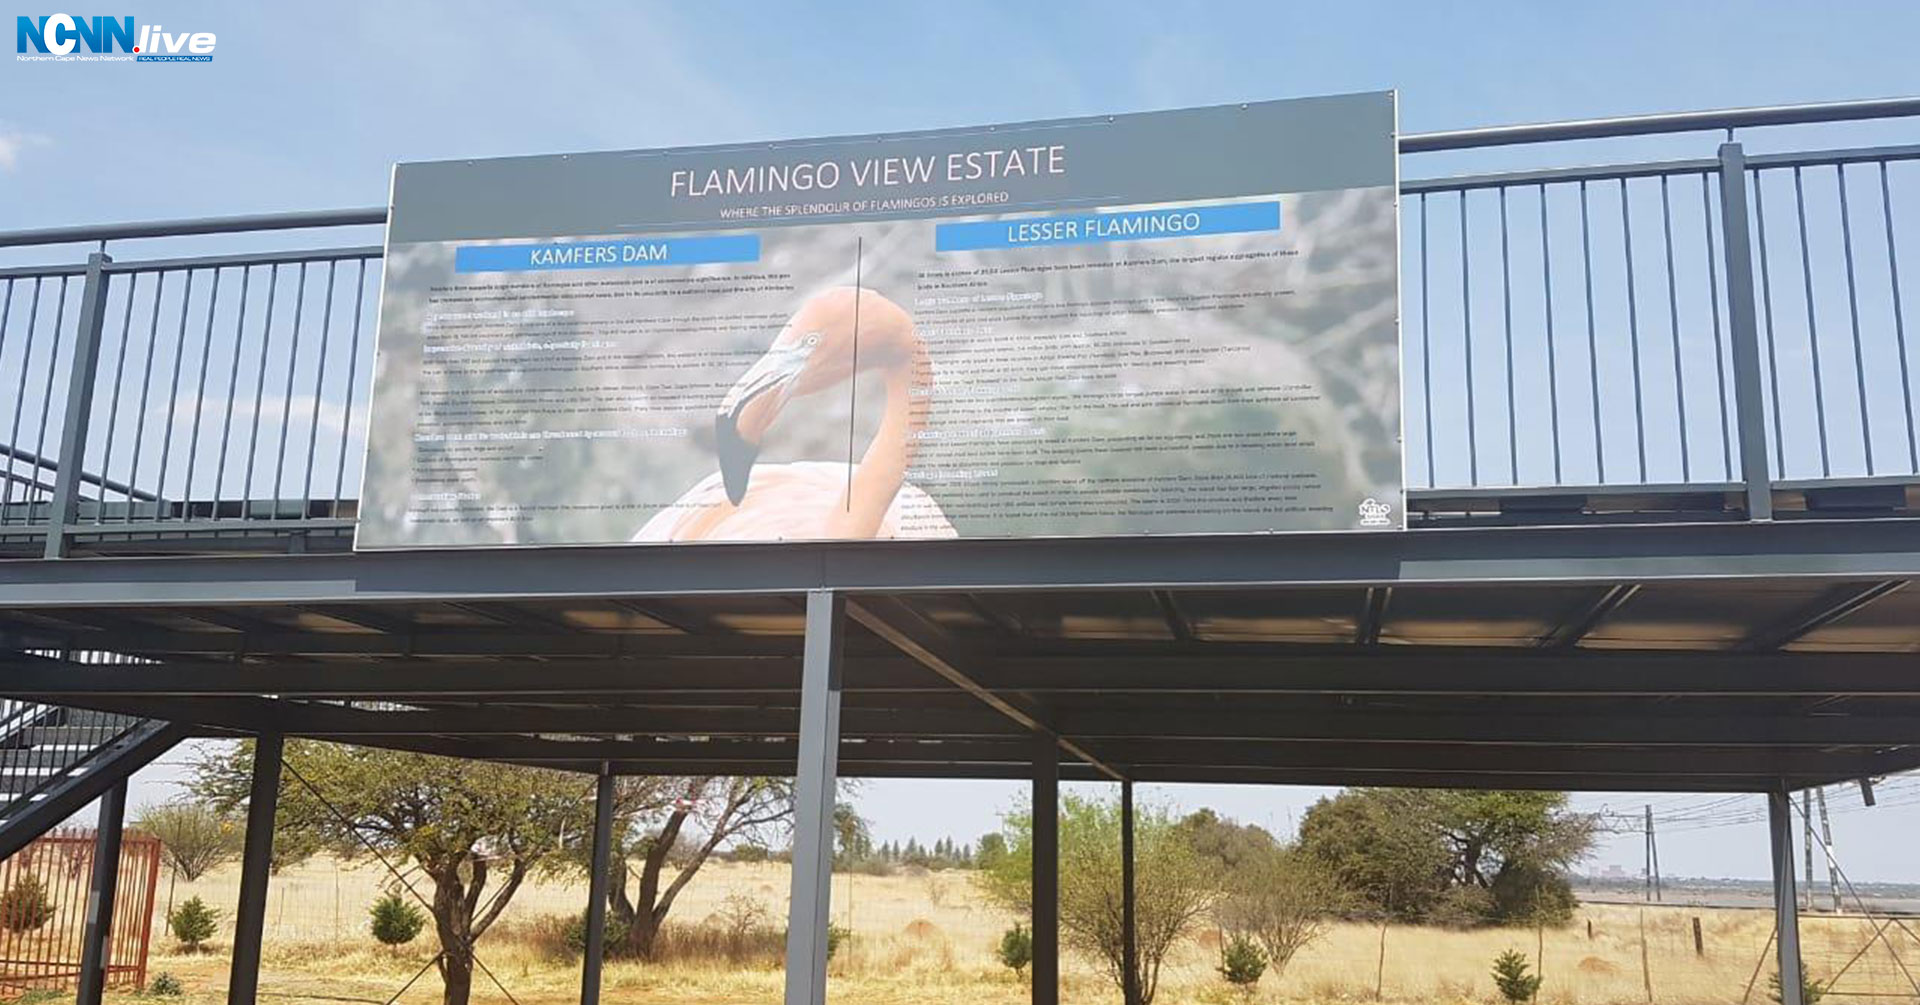 Flamingo View Kimberley Sol Plaatje